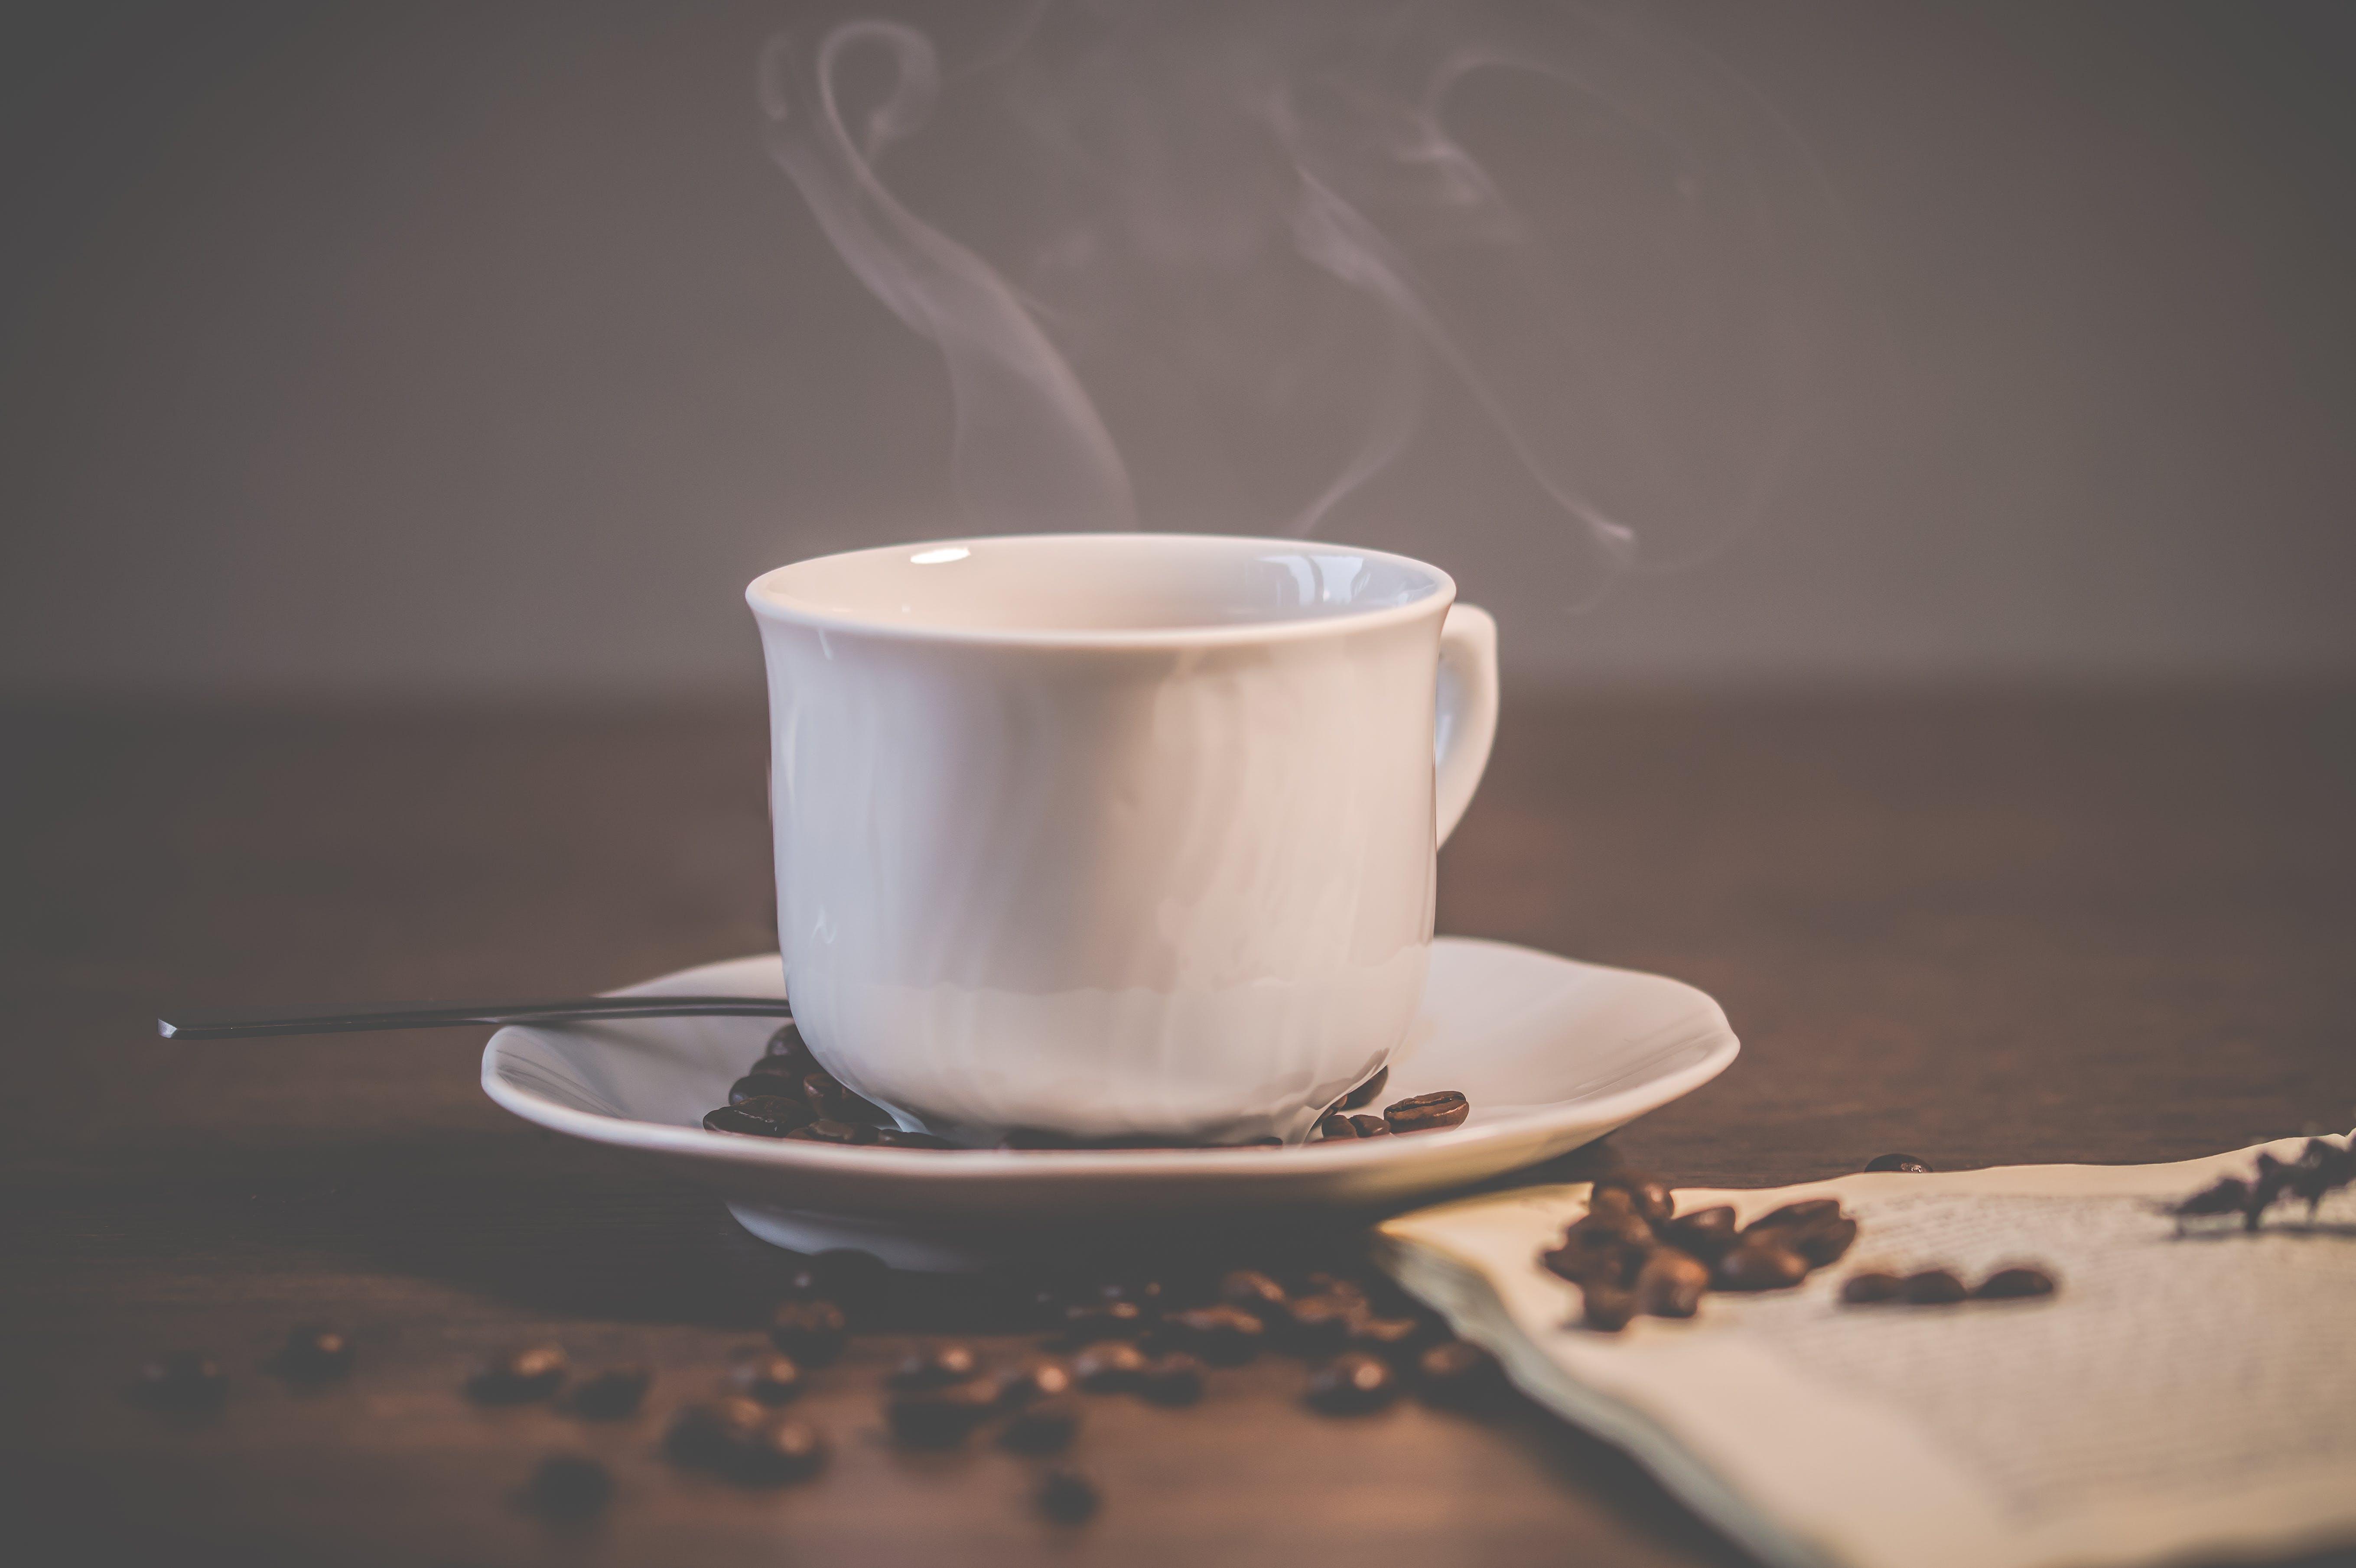 Kostenloses Stock Foto zu becher, besteck, braun, cappuccino